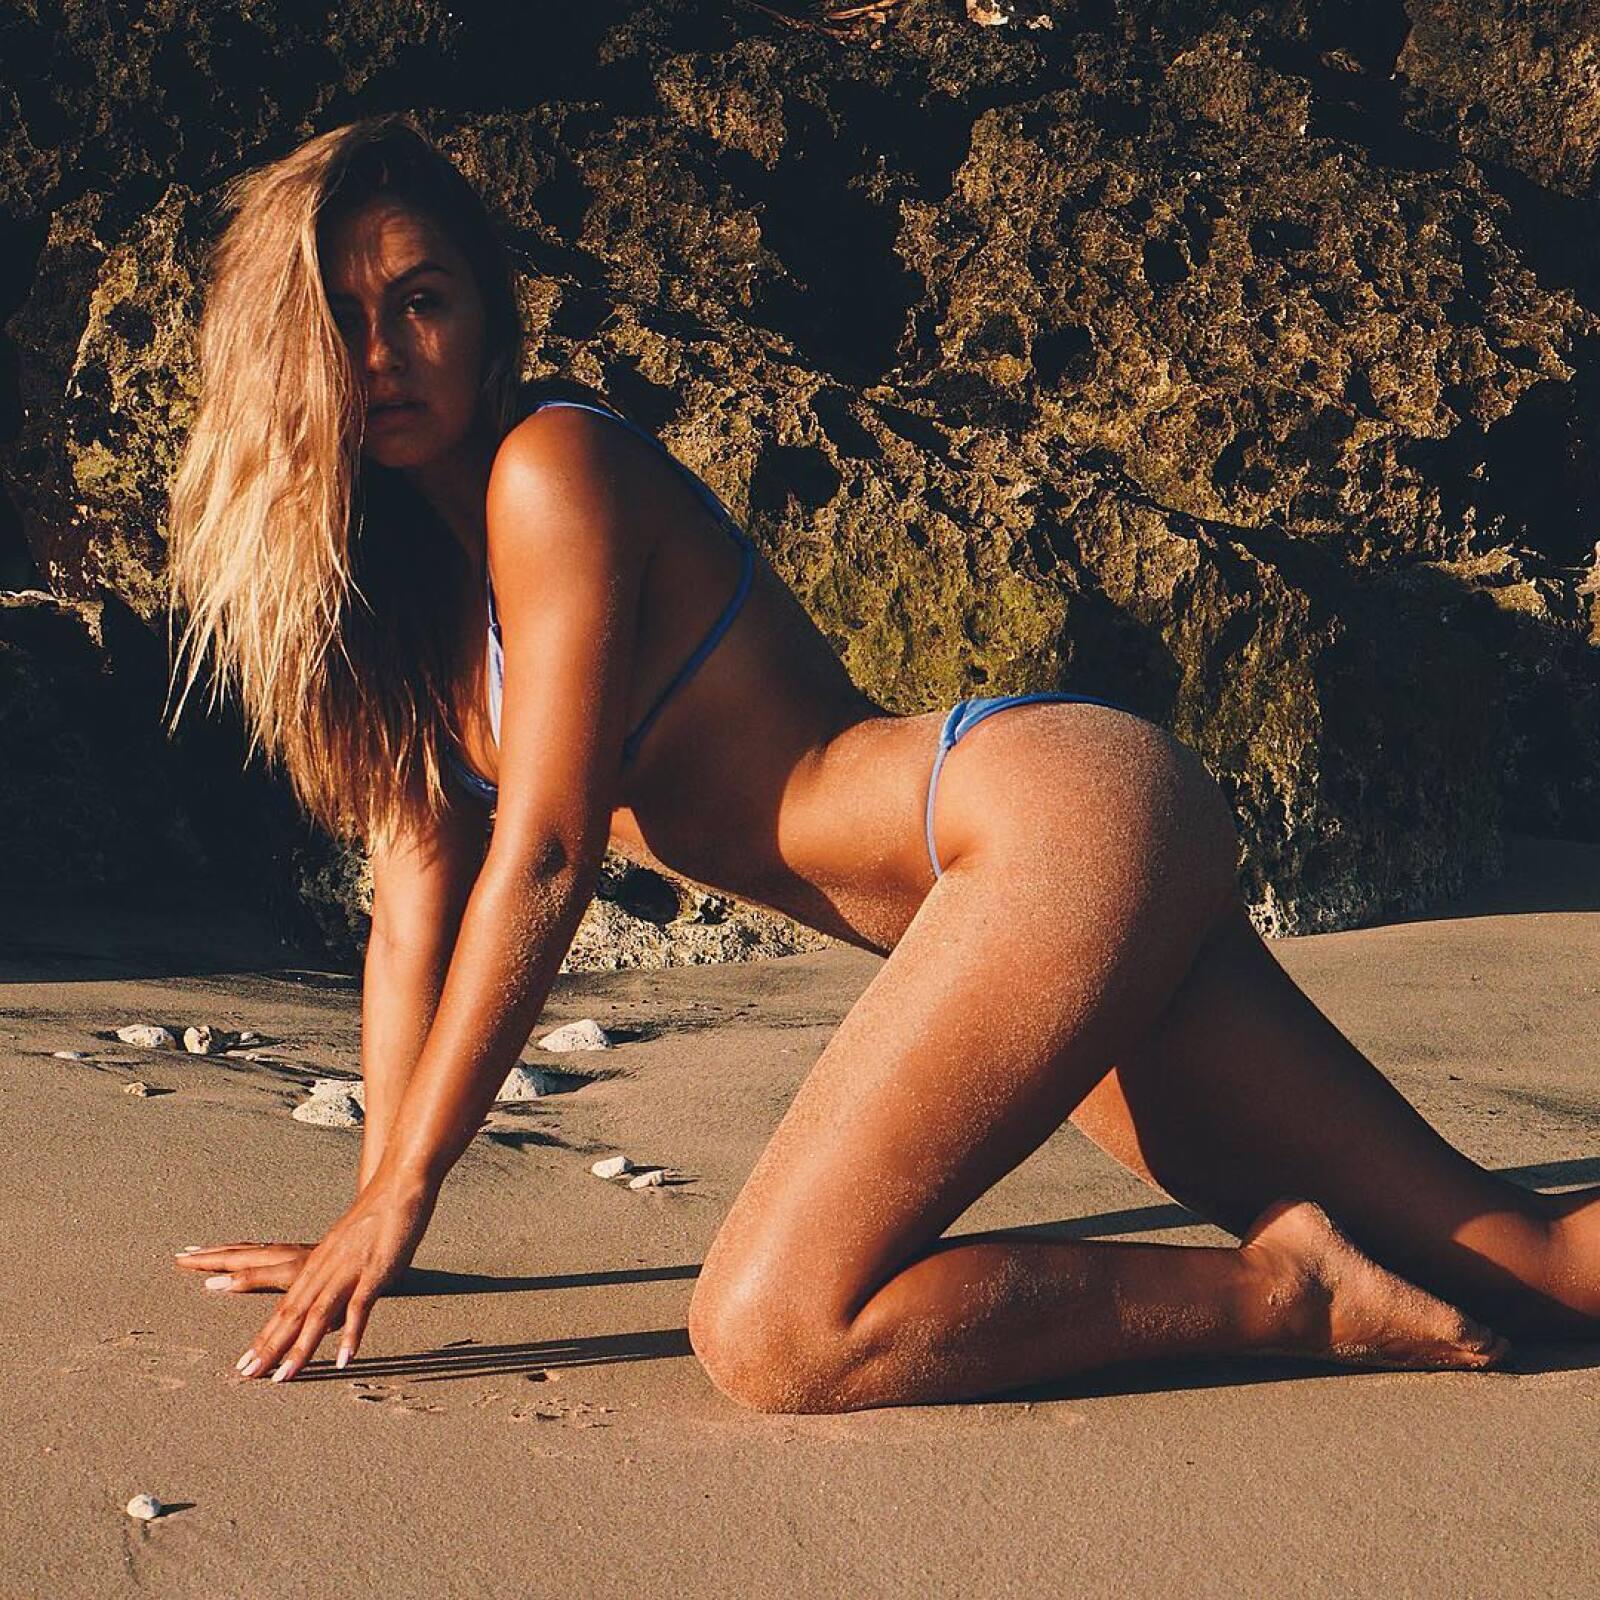 Steph Claire Smith